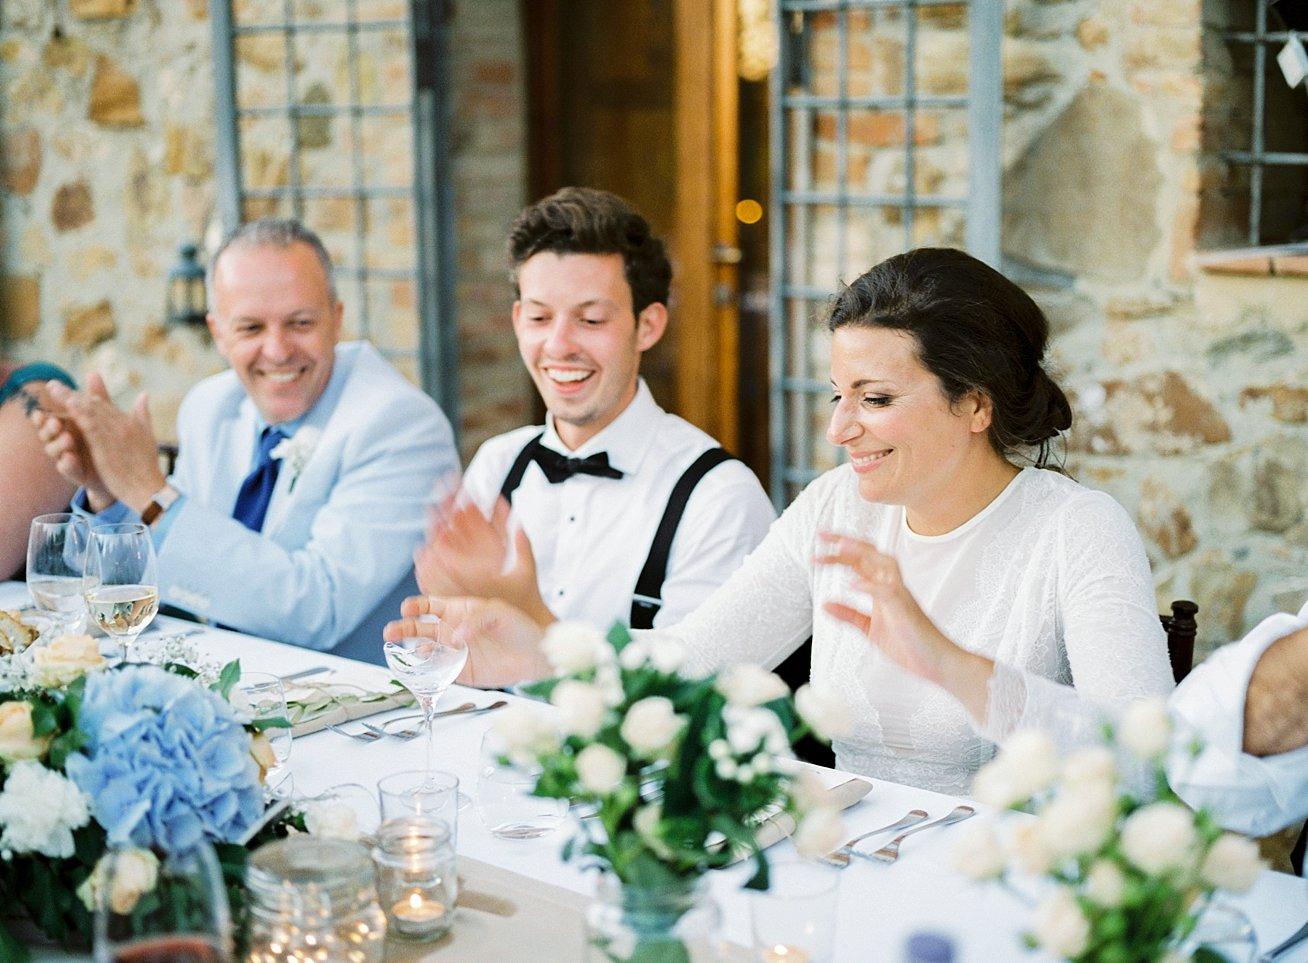 Amanda-Drost-Fotografie-Bruioft-Italie-Trouwen-buitenland-destination-wedding-italy_0078.jpg